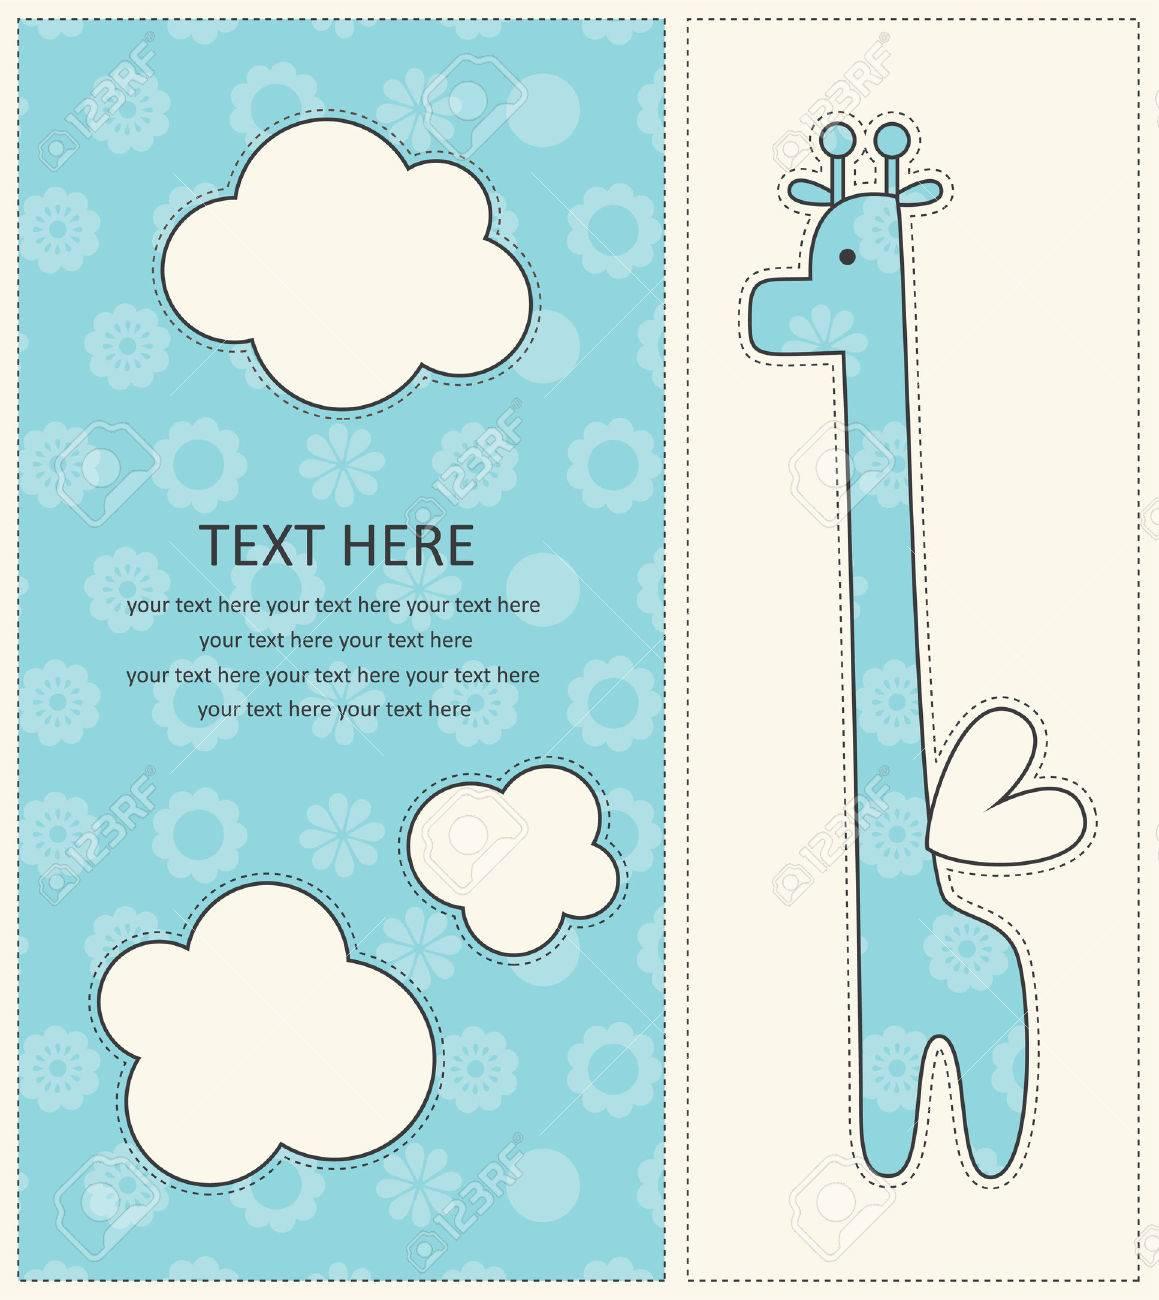 Baby Boy Announcement Card With Cute Giraffe Vector Illustration – Cute Baby Boy Announcements